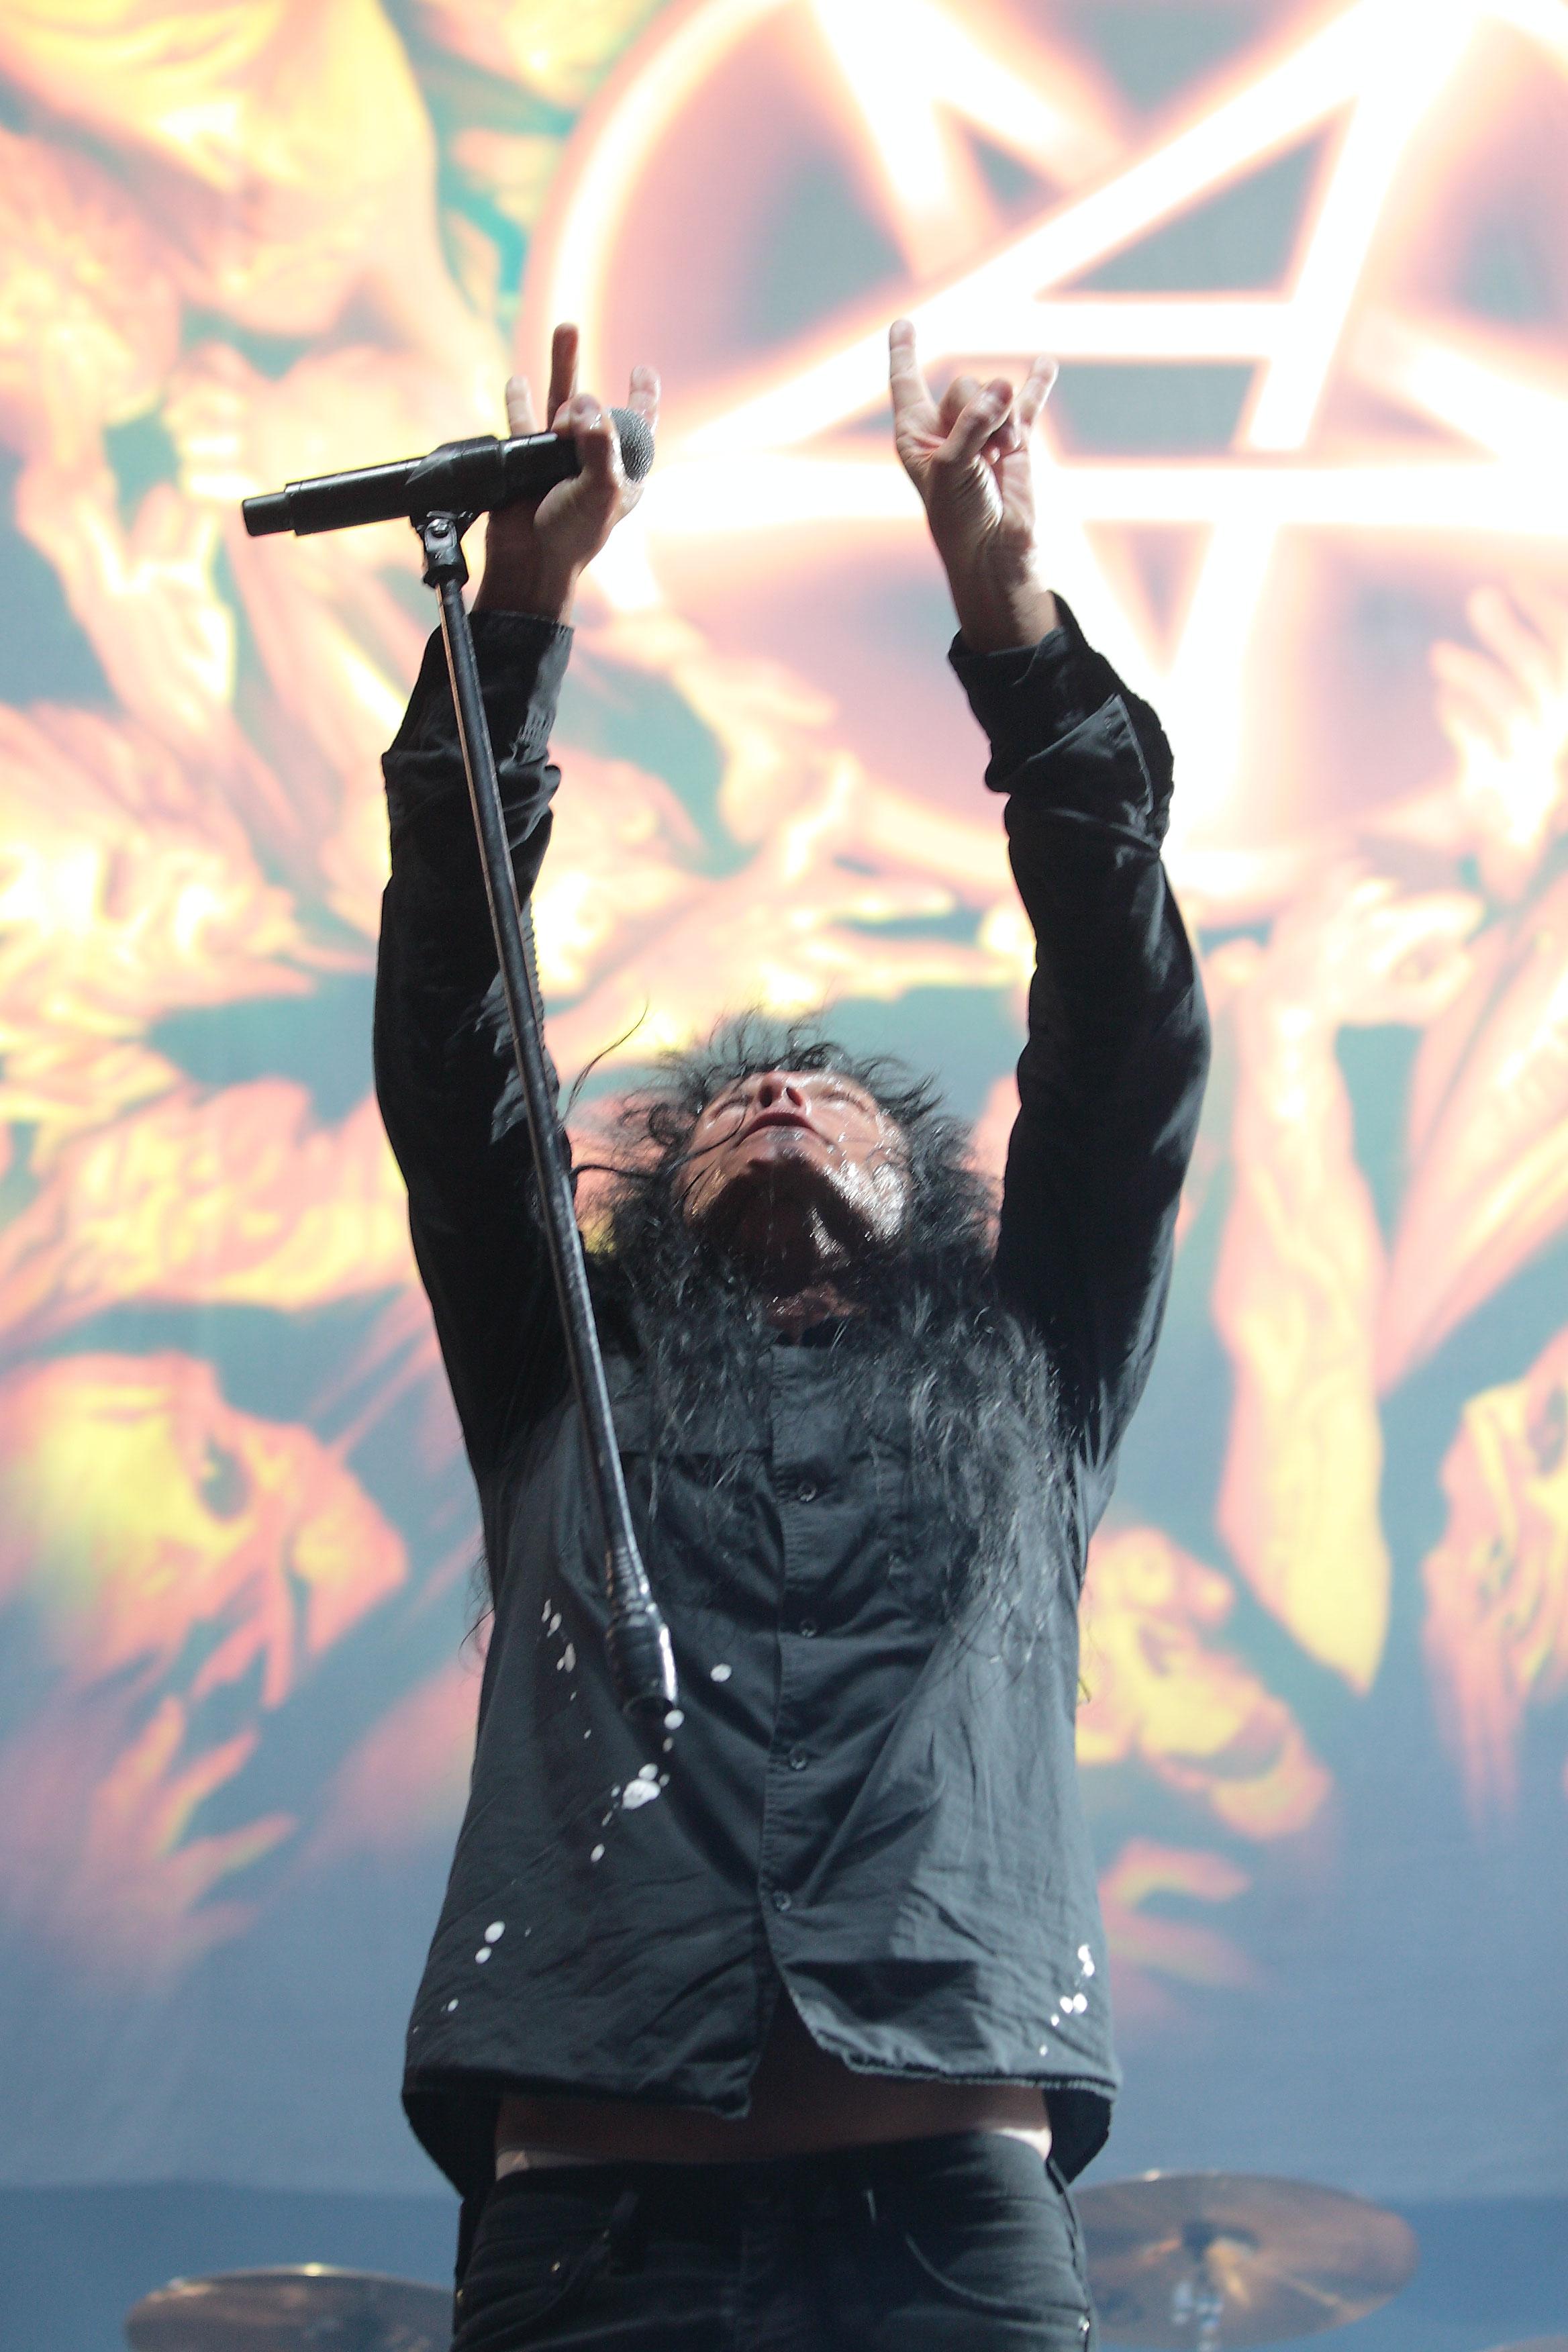 Joey Belladonna, de Anthrax, recordando a Jeff Hanneman y a Dimebag Darrell. Foto: Eduard Tuset